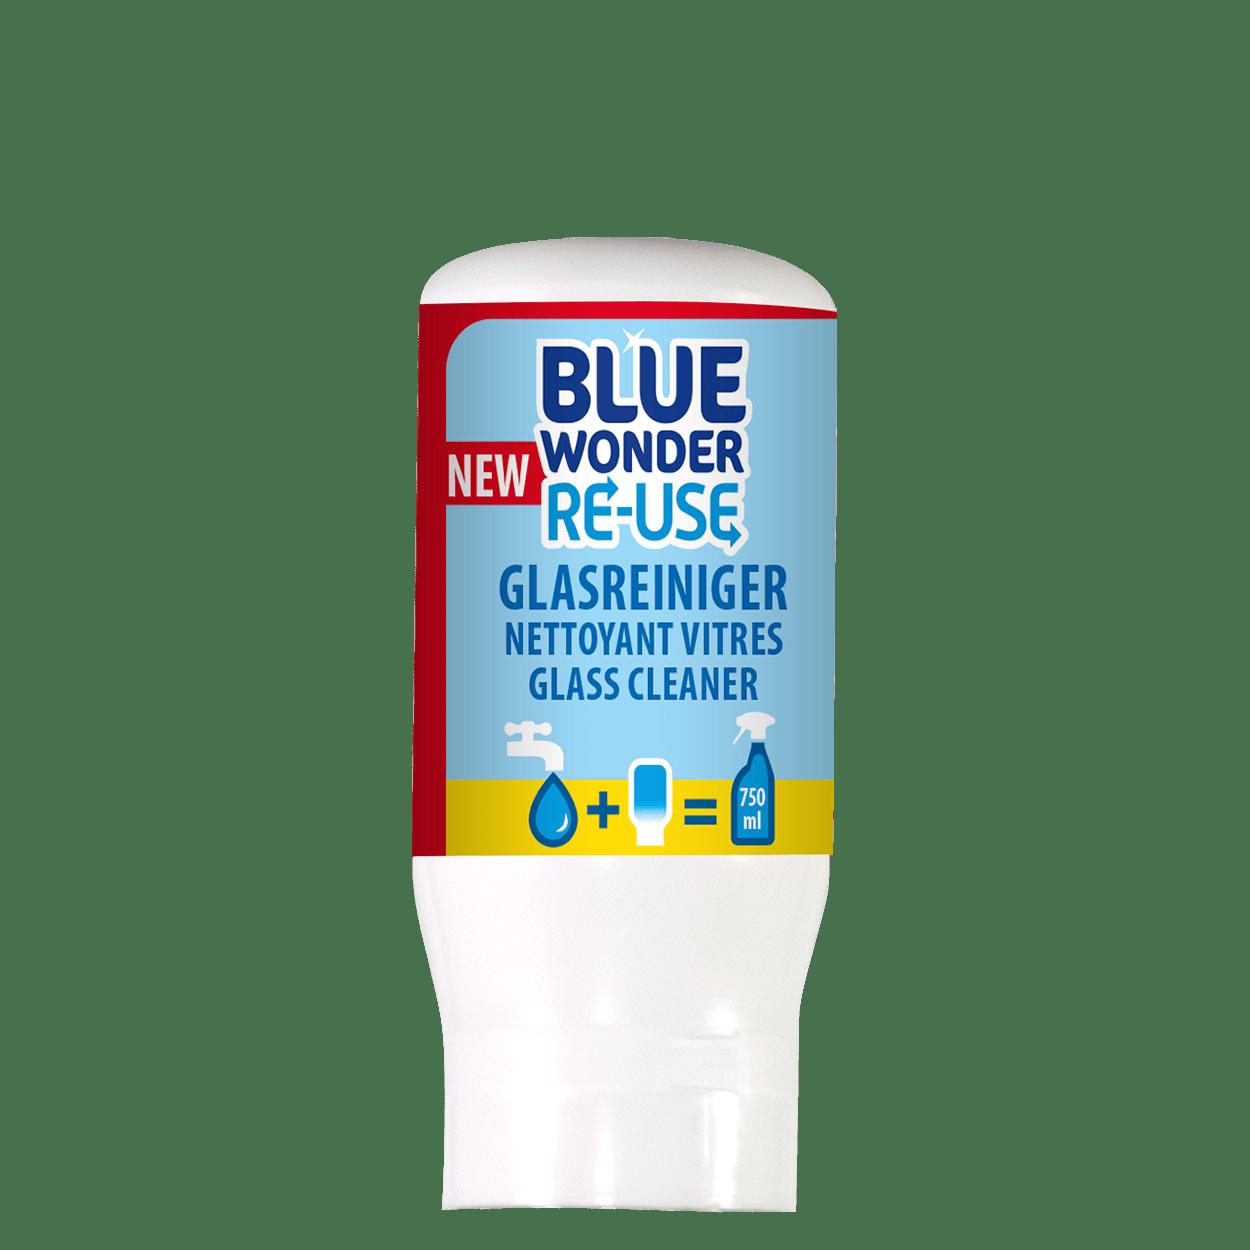 8712038001974 Blue Wonder Glasreiniger_refill capsule_102020